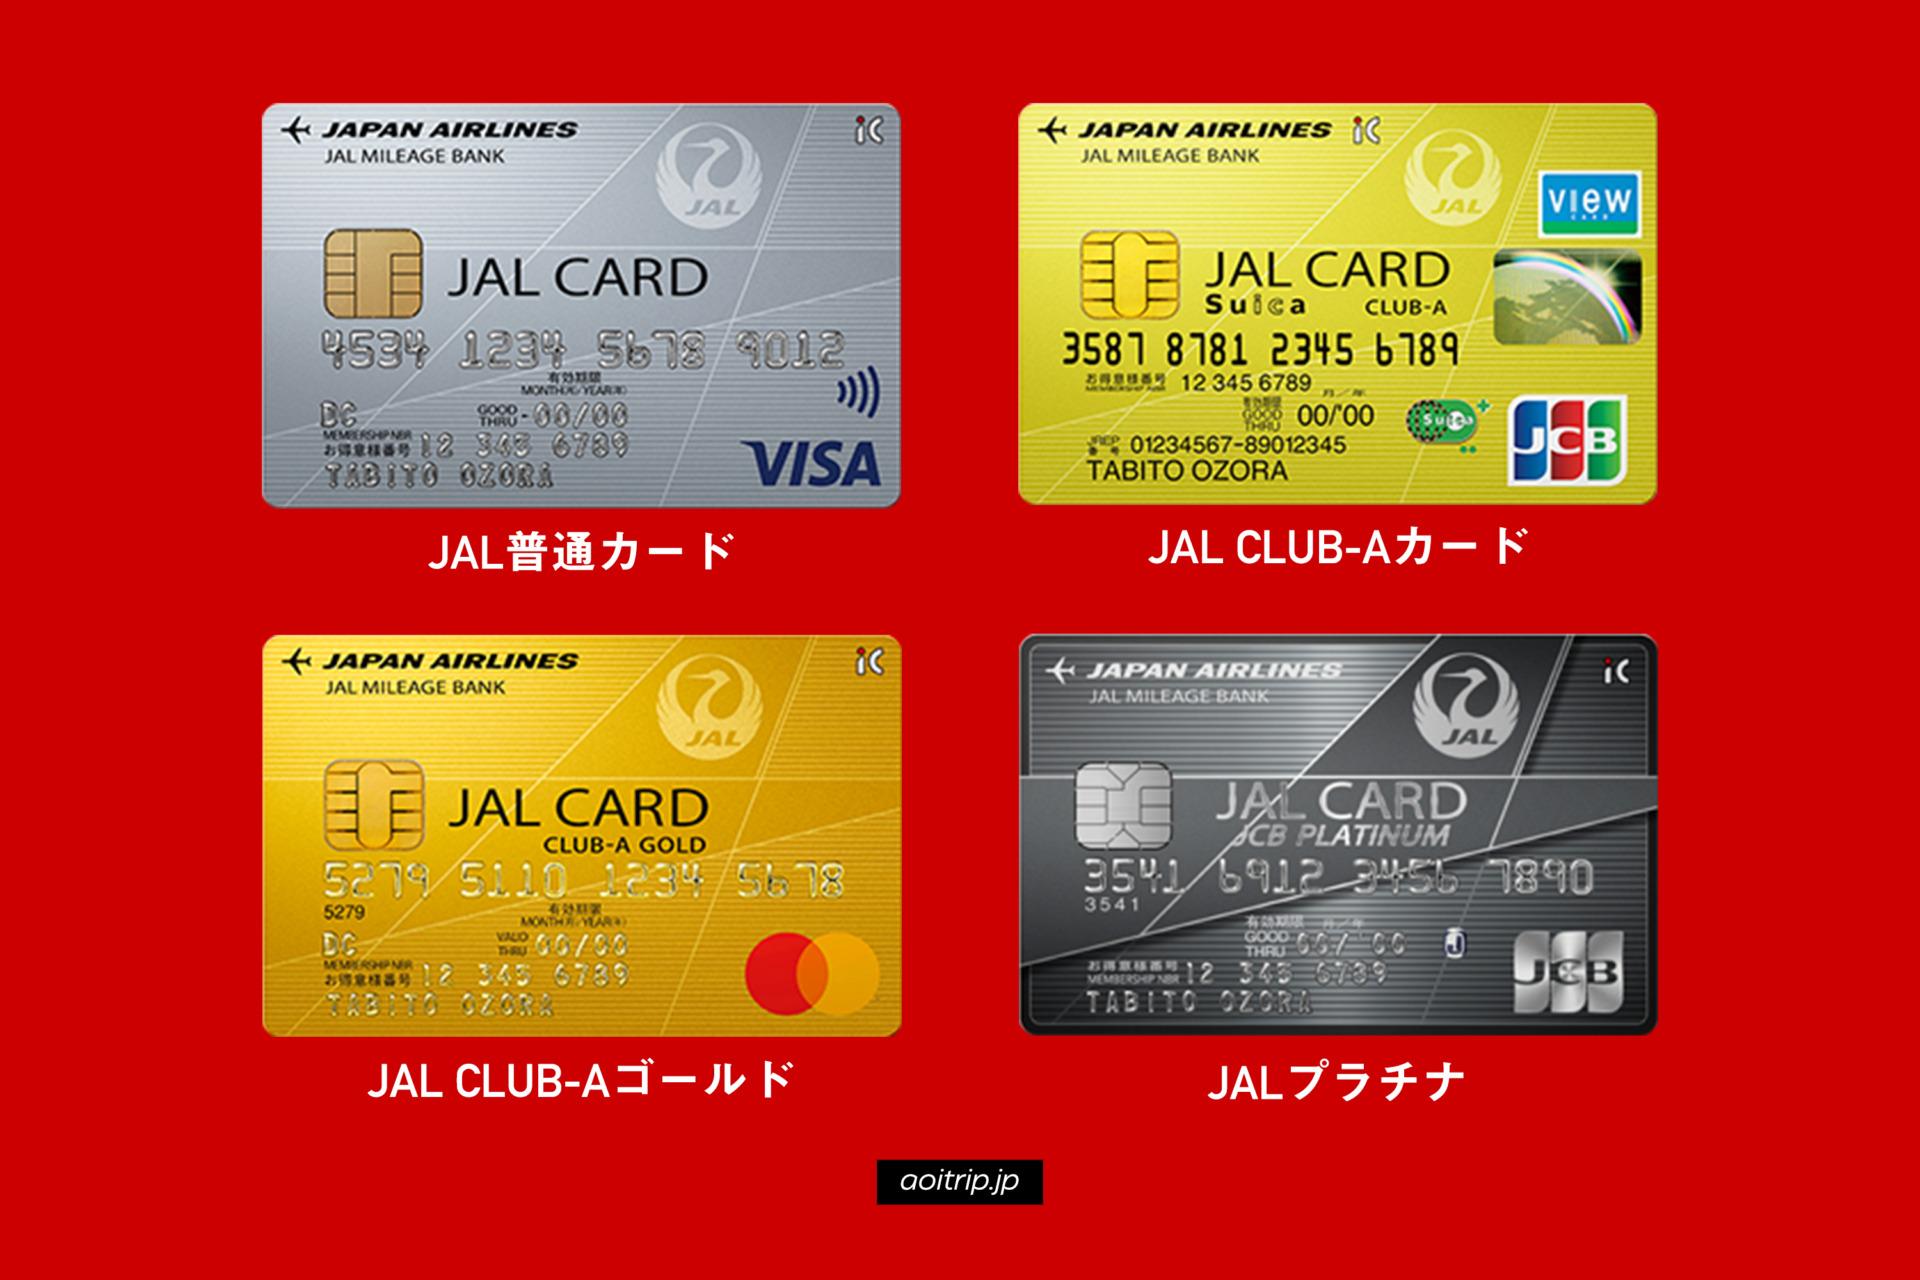 JALカードの種類(JAL普通カード、JAL CLUB-Aカード、JAL CLUB-Aゴールド、JALプラチナ)